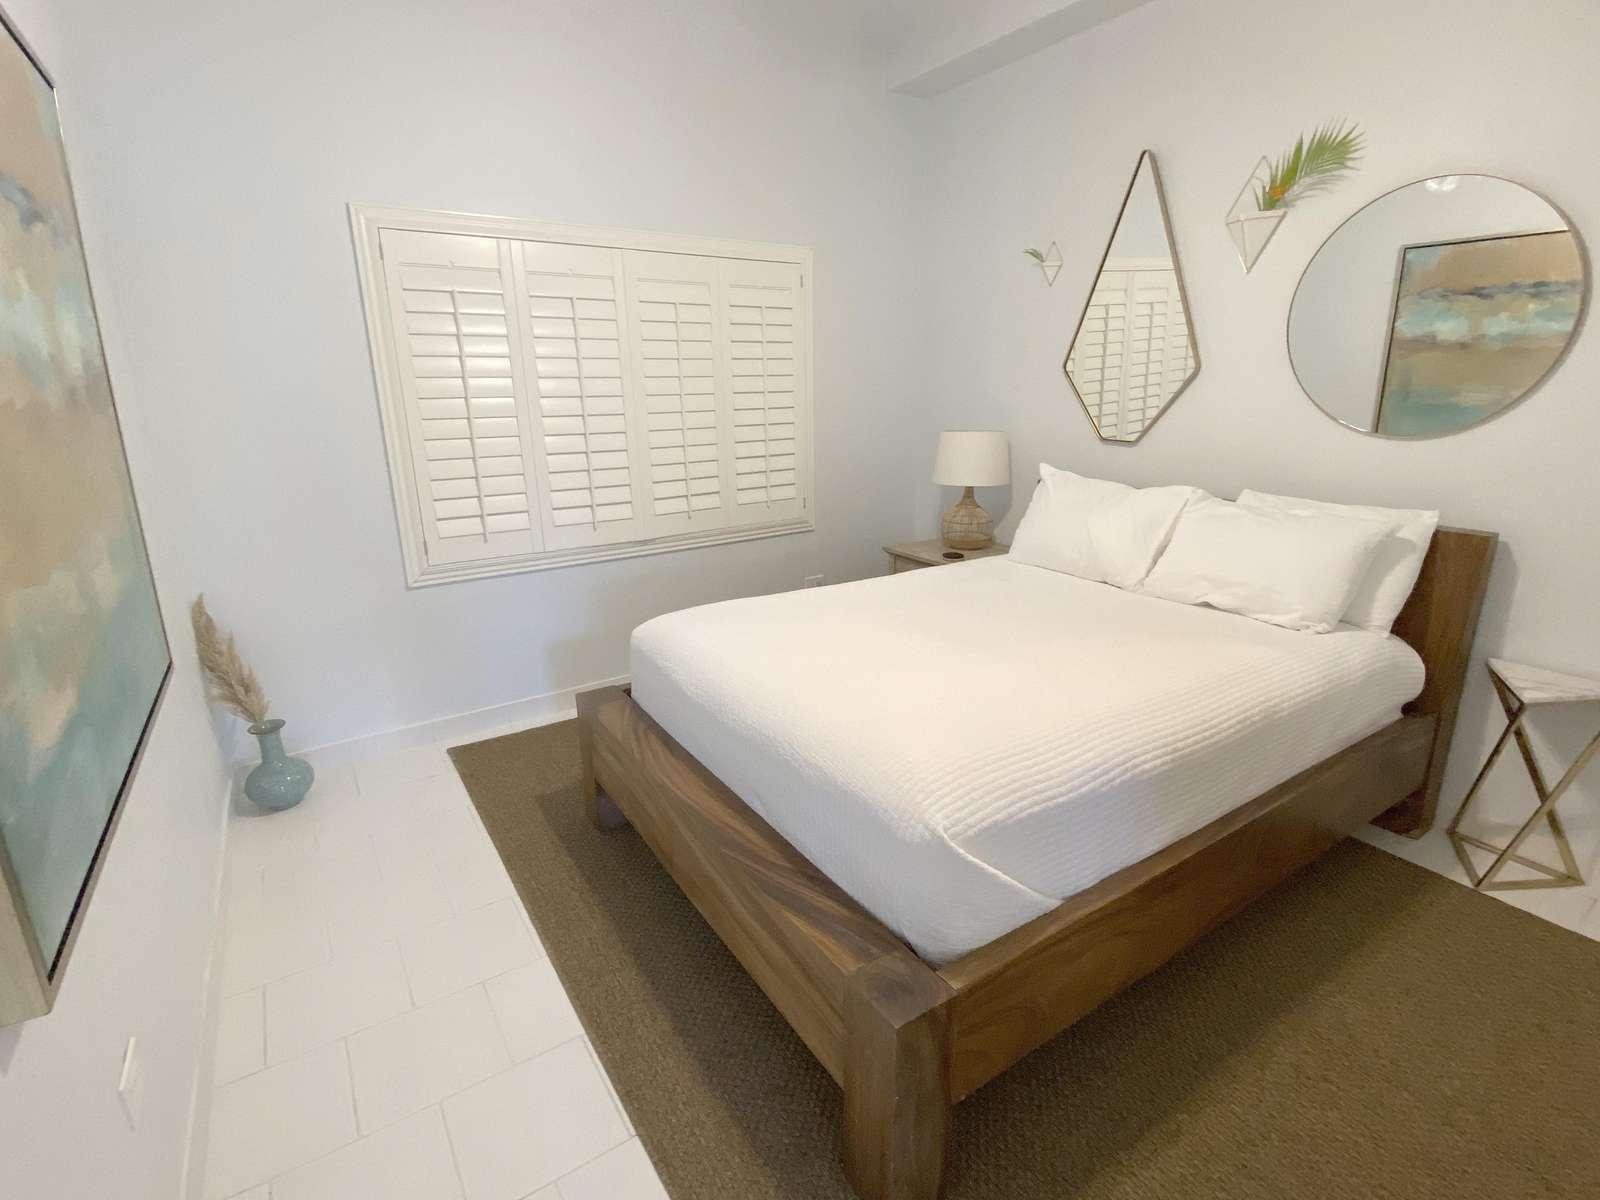 Queen Bed in Private Bedroom in Pool Level Casita Apartment